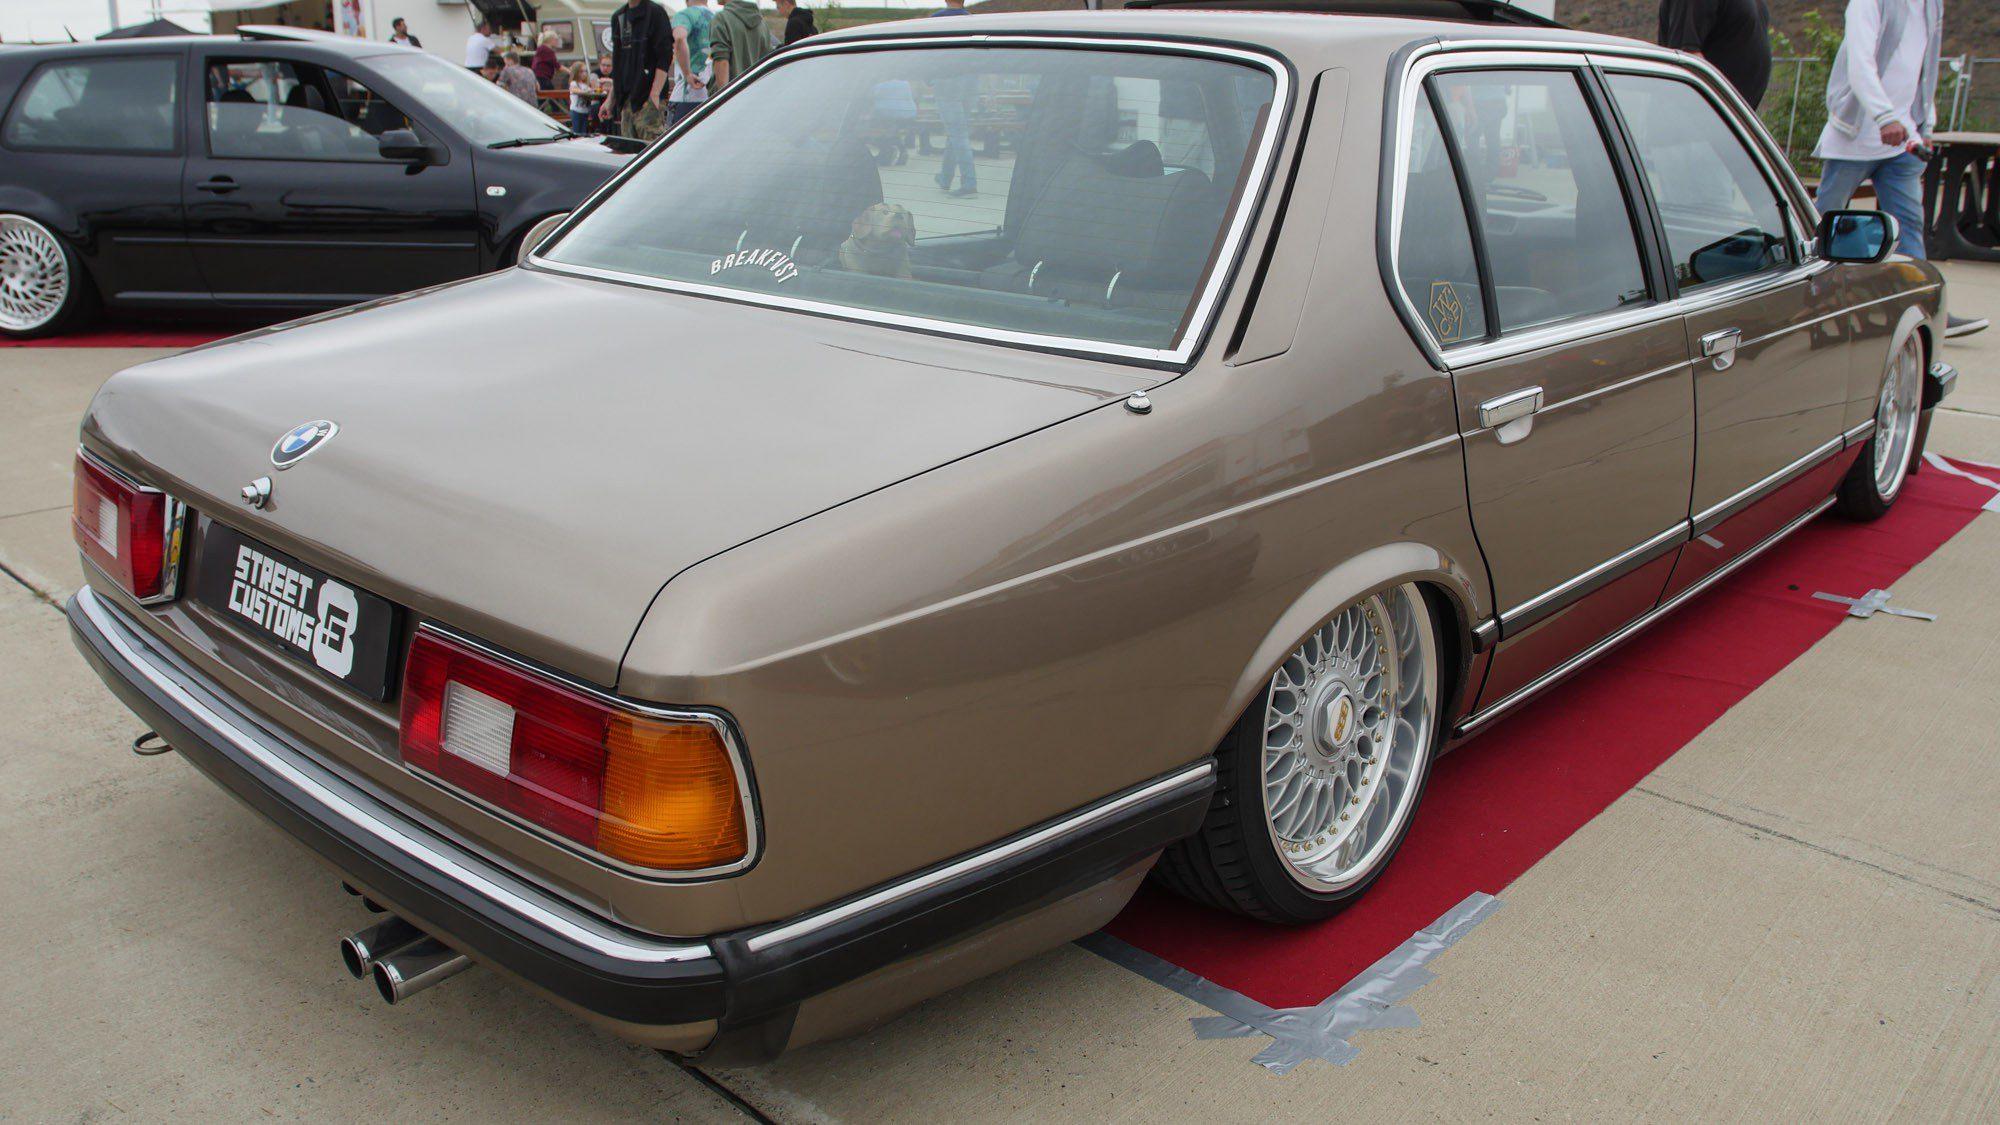 Heckansicht des BMW E23